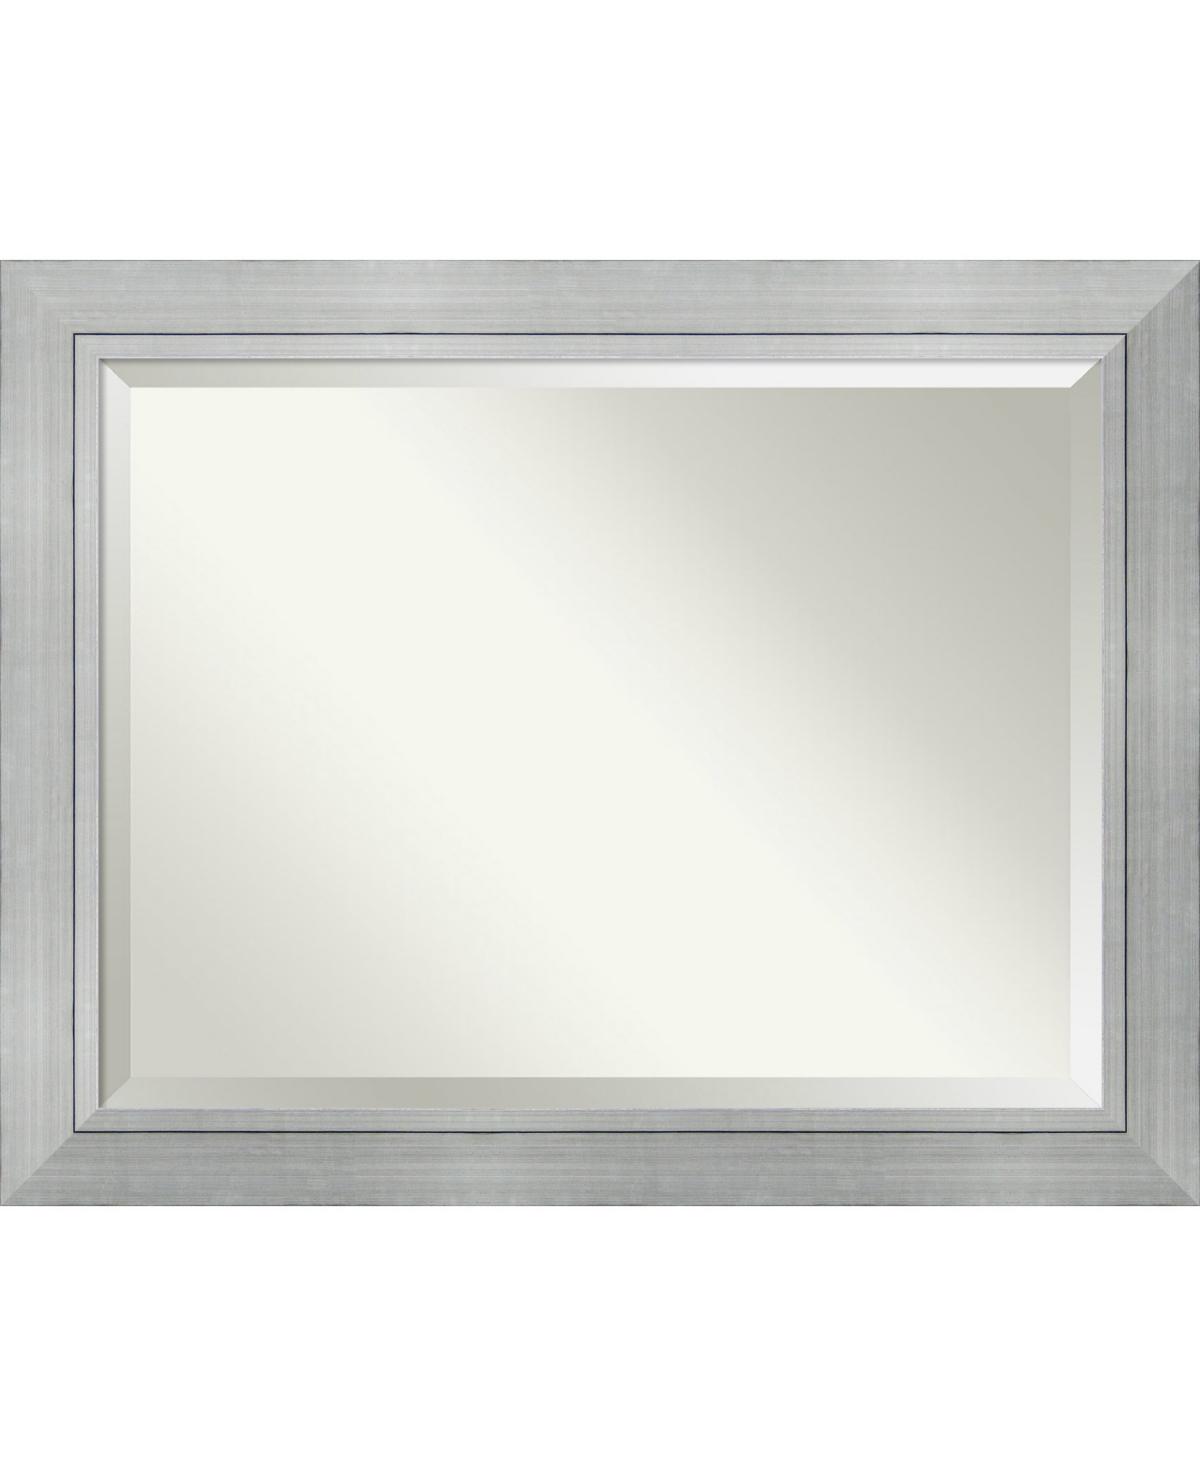 Amanti Art Romano 47x37 Bathroom Mirror